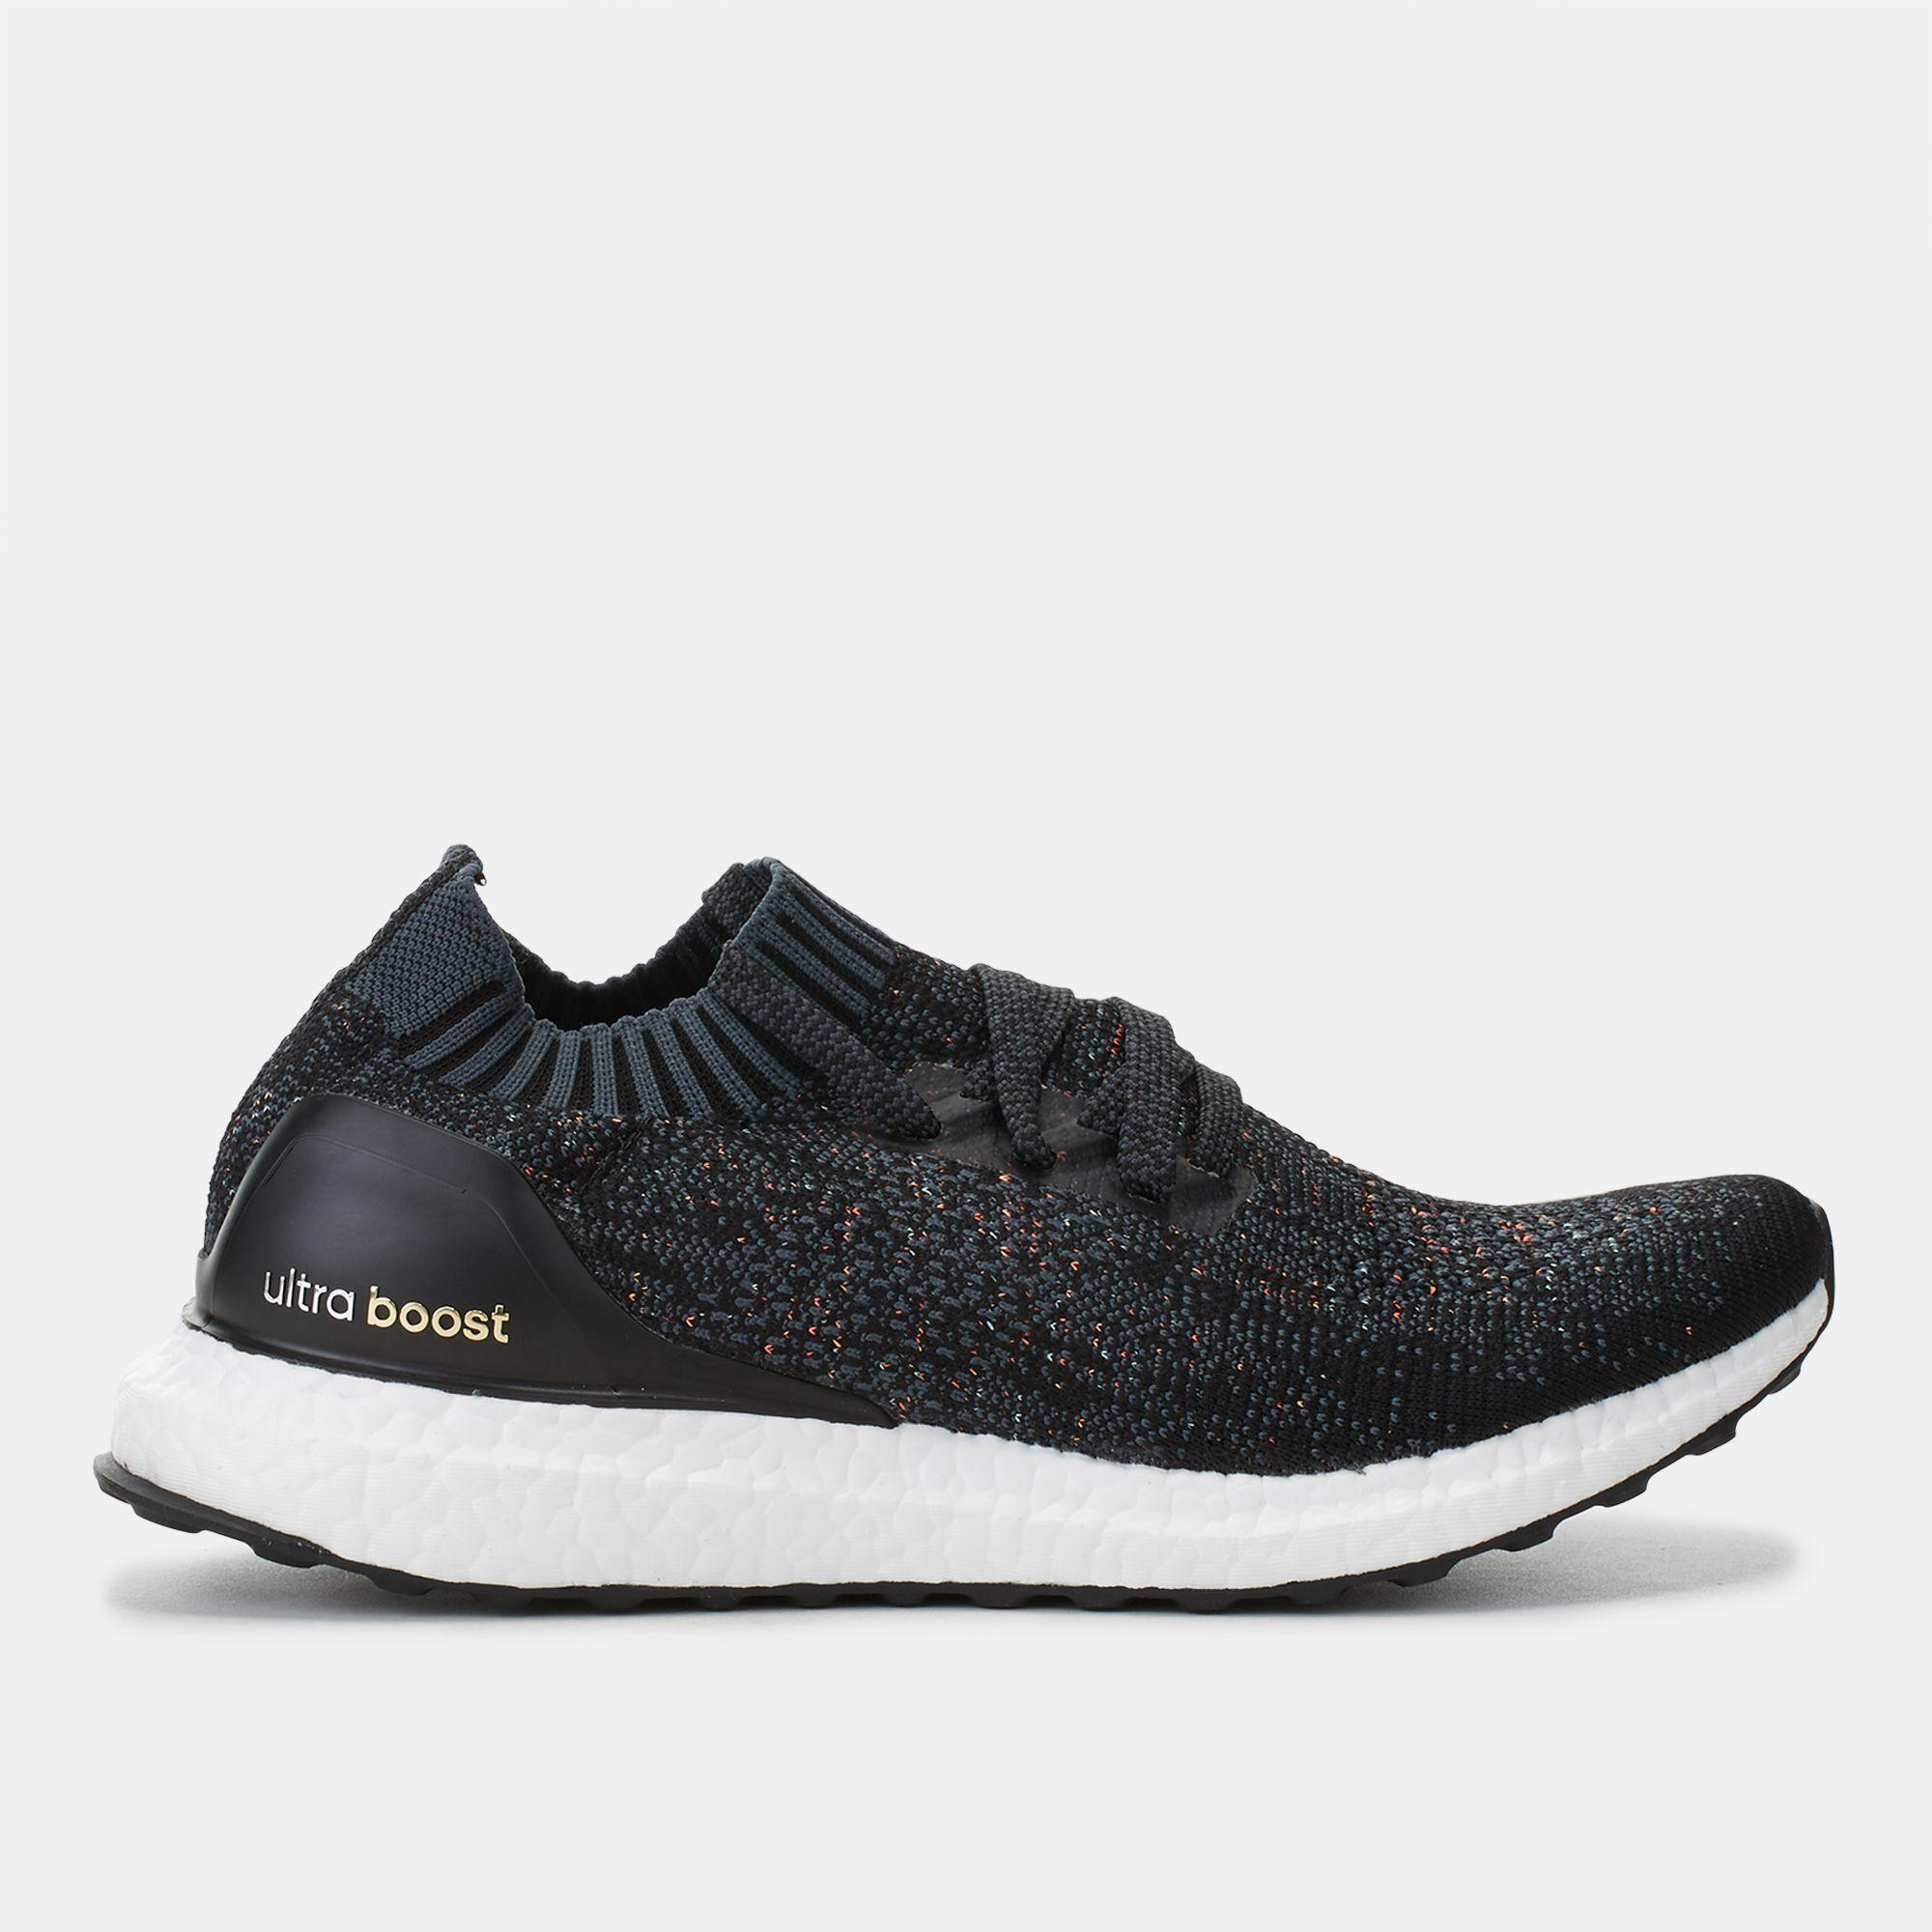 06ceedd19 Shop Black adidas UltraBOOST Uncaged Shoe for Womens by adidas